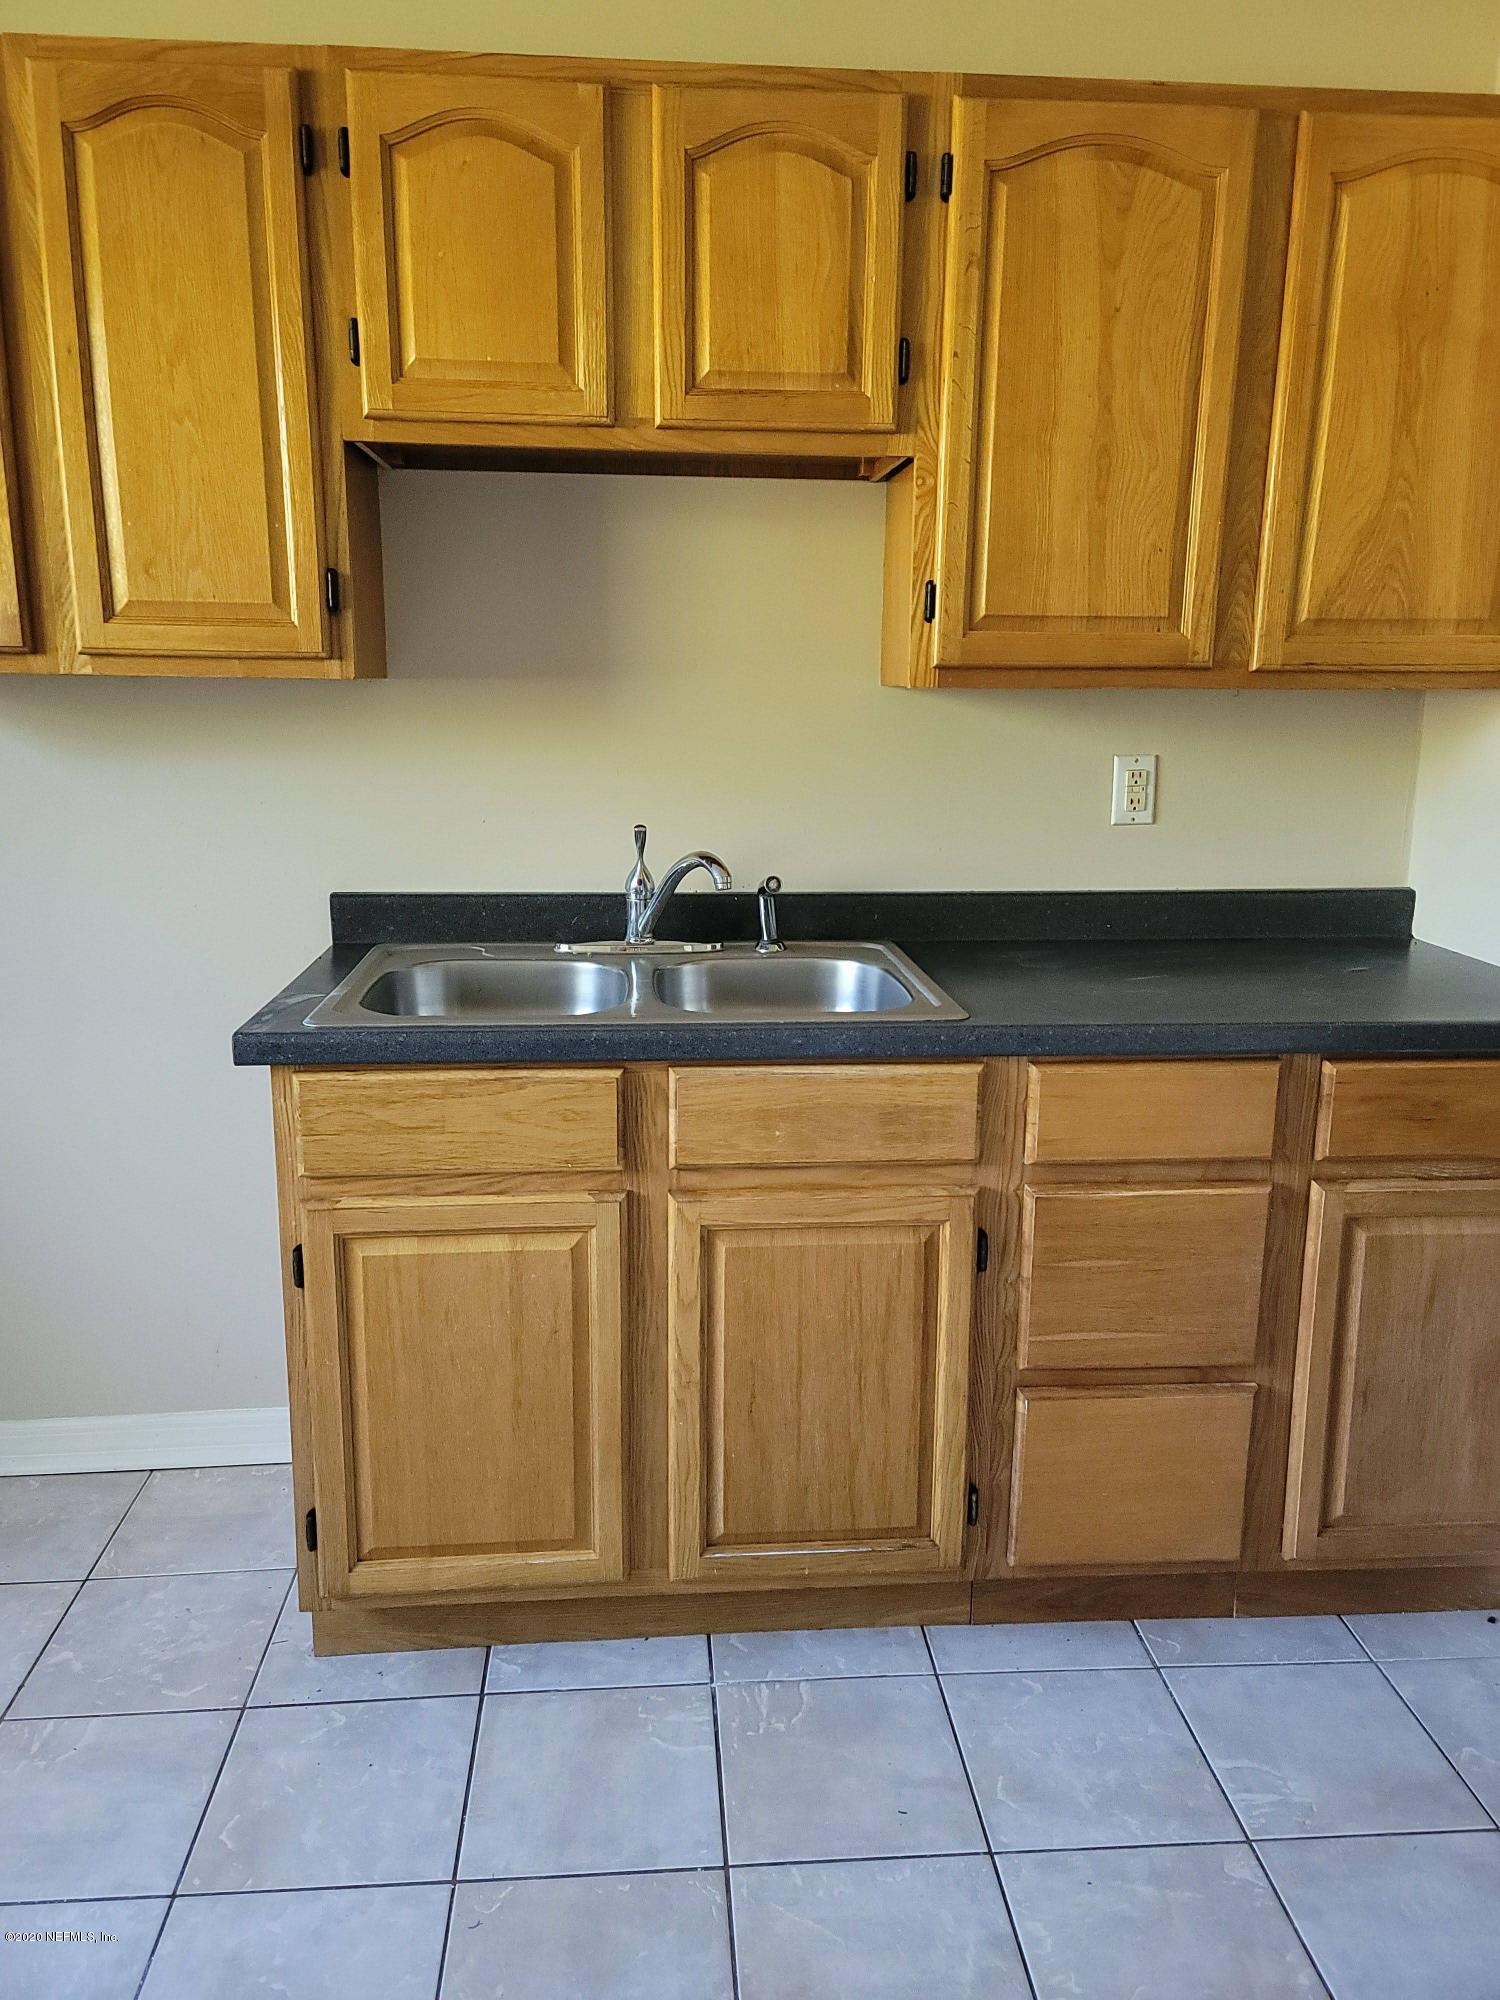 6754 TINKERBELL, JACKSONVILLE, FLORIDA 32210, 3 Bedrooms Bedrooms, ,1 BathroomBathrooms,Rental,For Rent,TINKERBELL,1083028